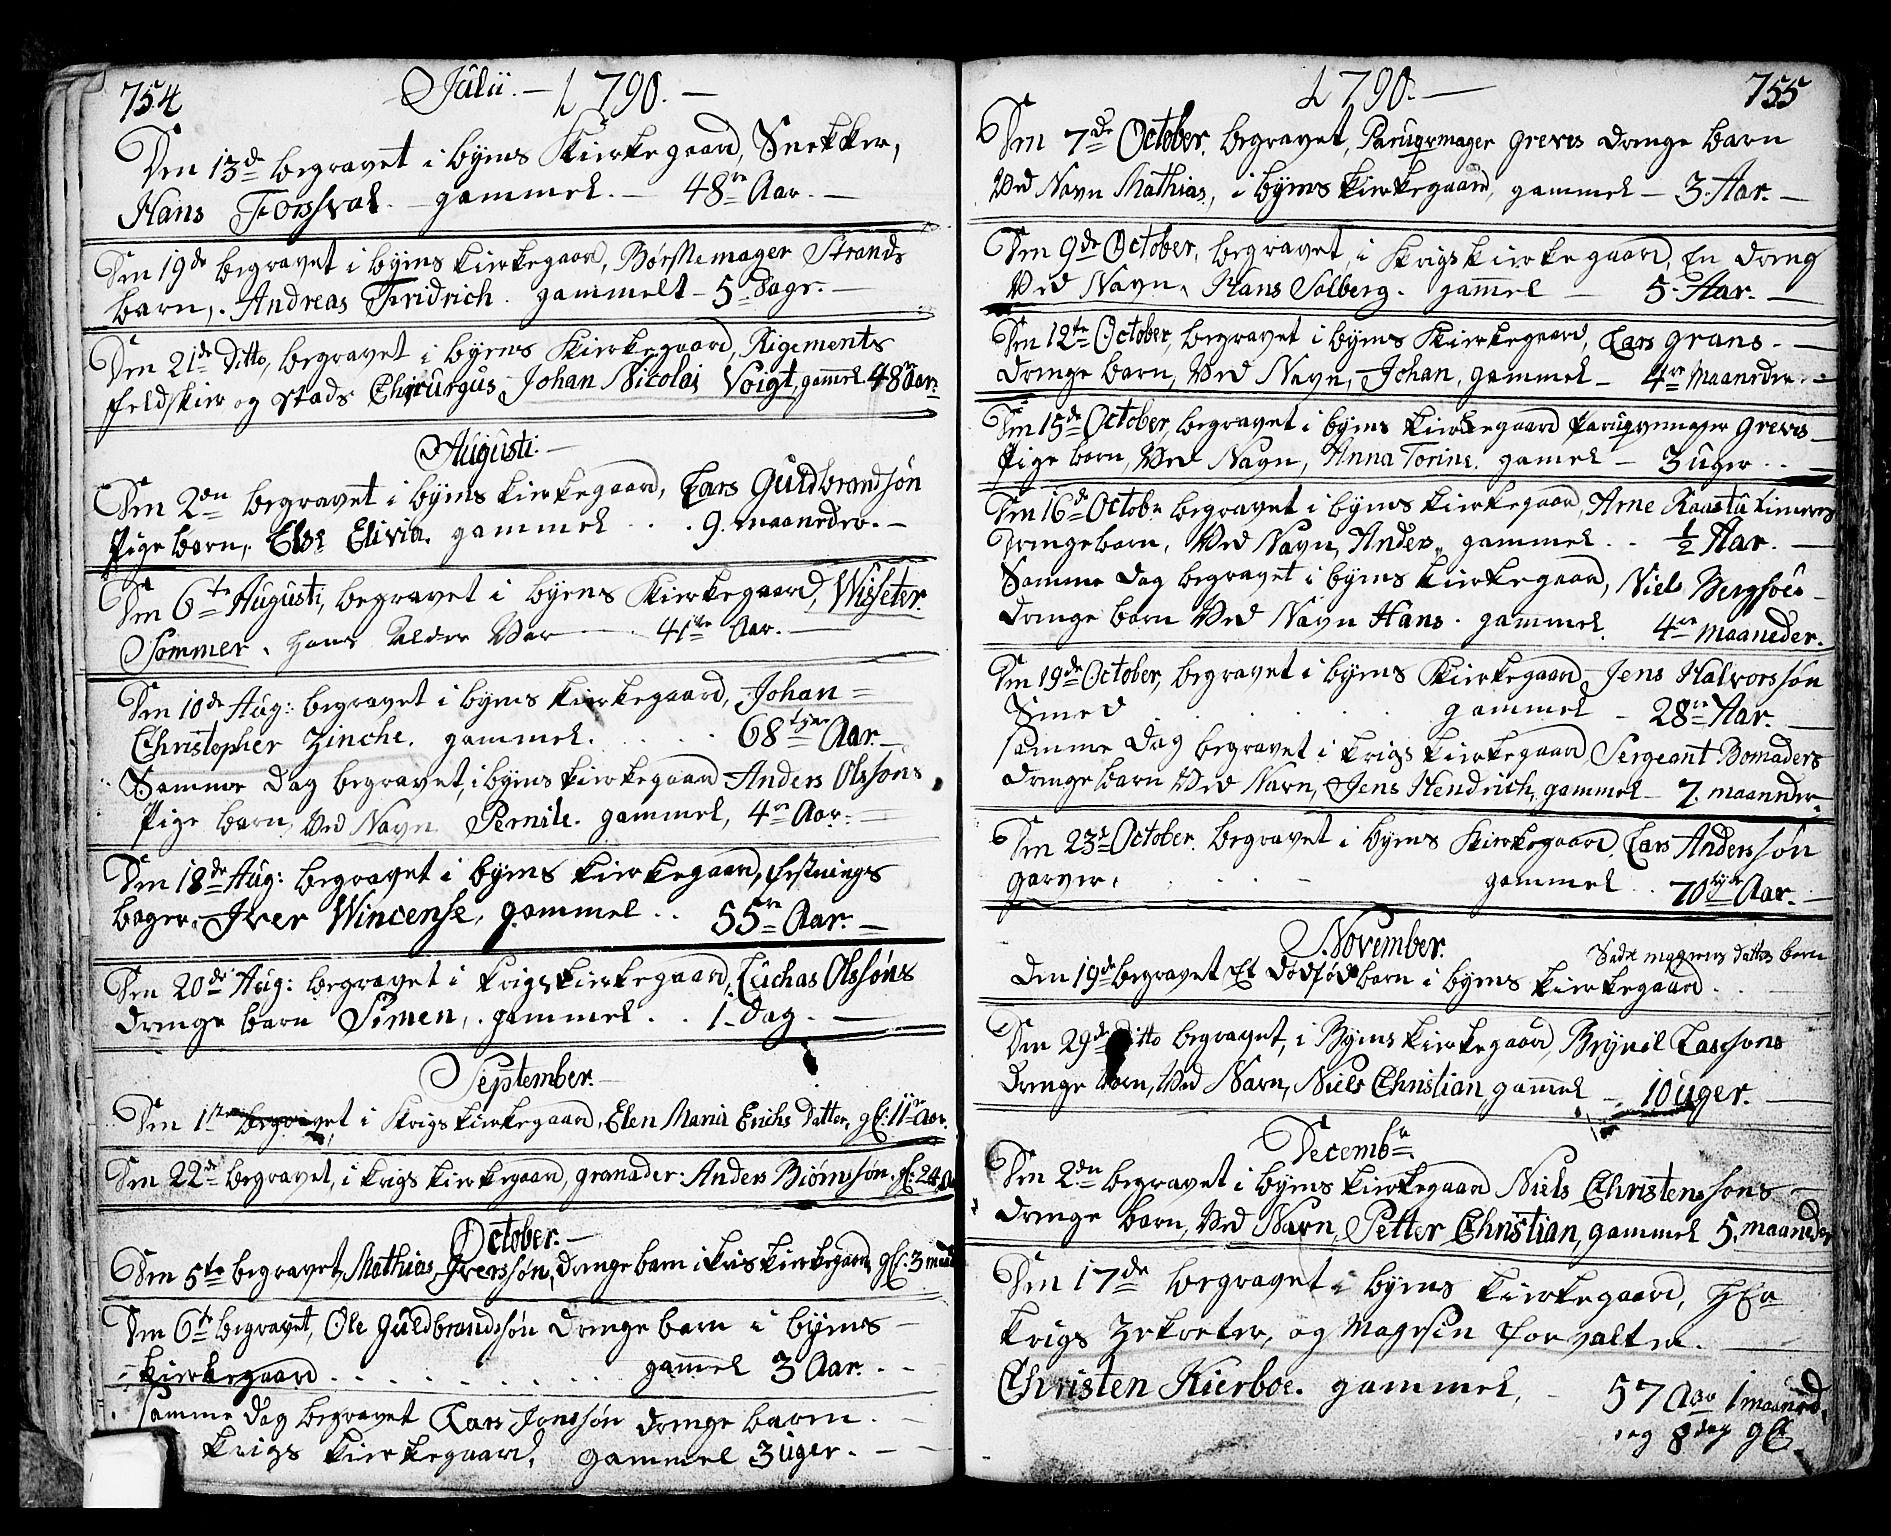 SAO, Fredrikstad prestekontor Kirkebøker, F/Fa/L0002: Ministerialbok nr. 2, 1750-1804, s. 754-755